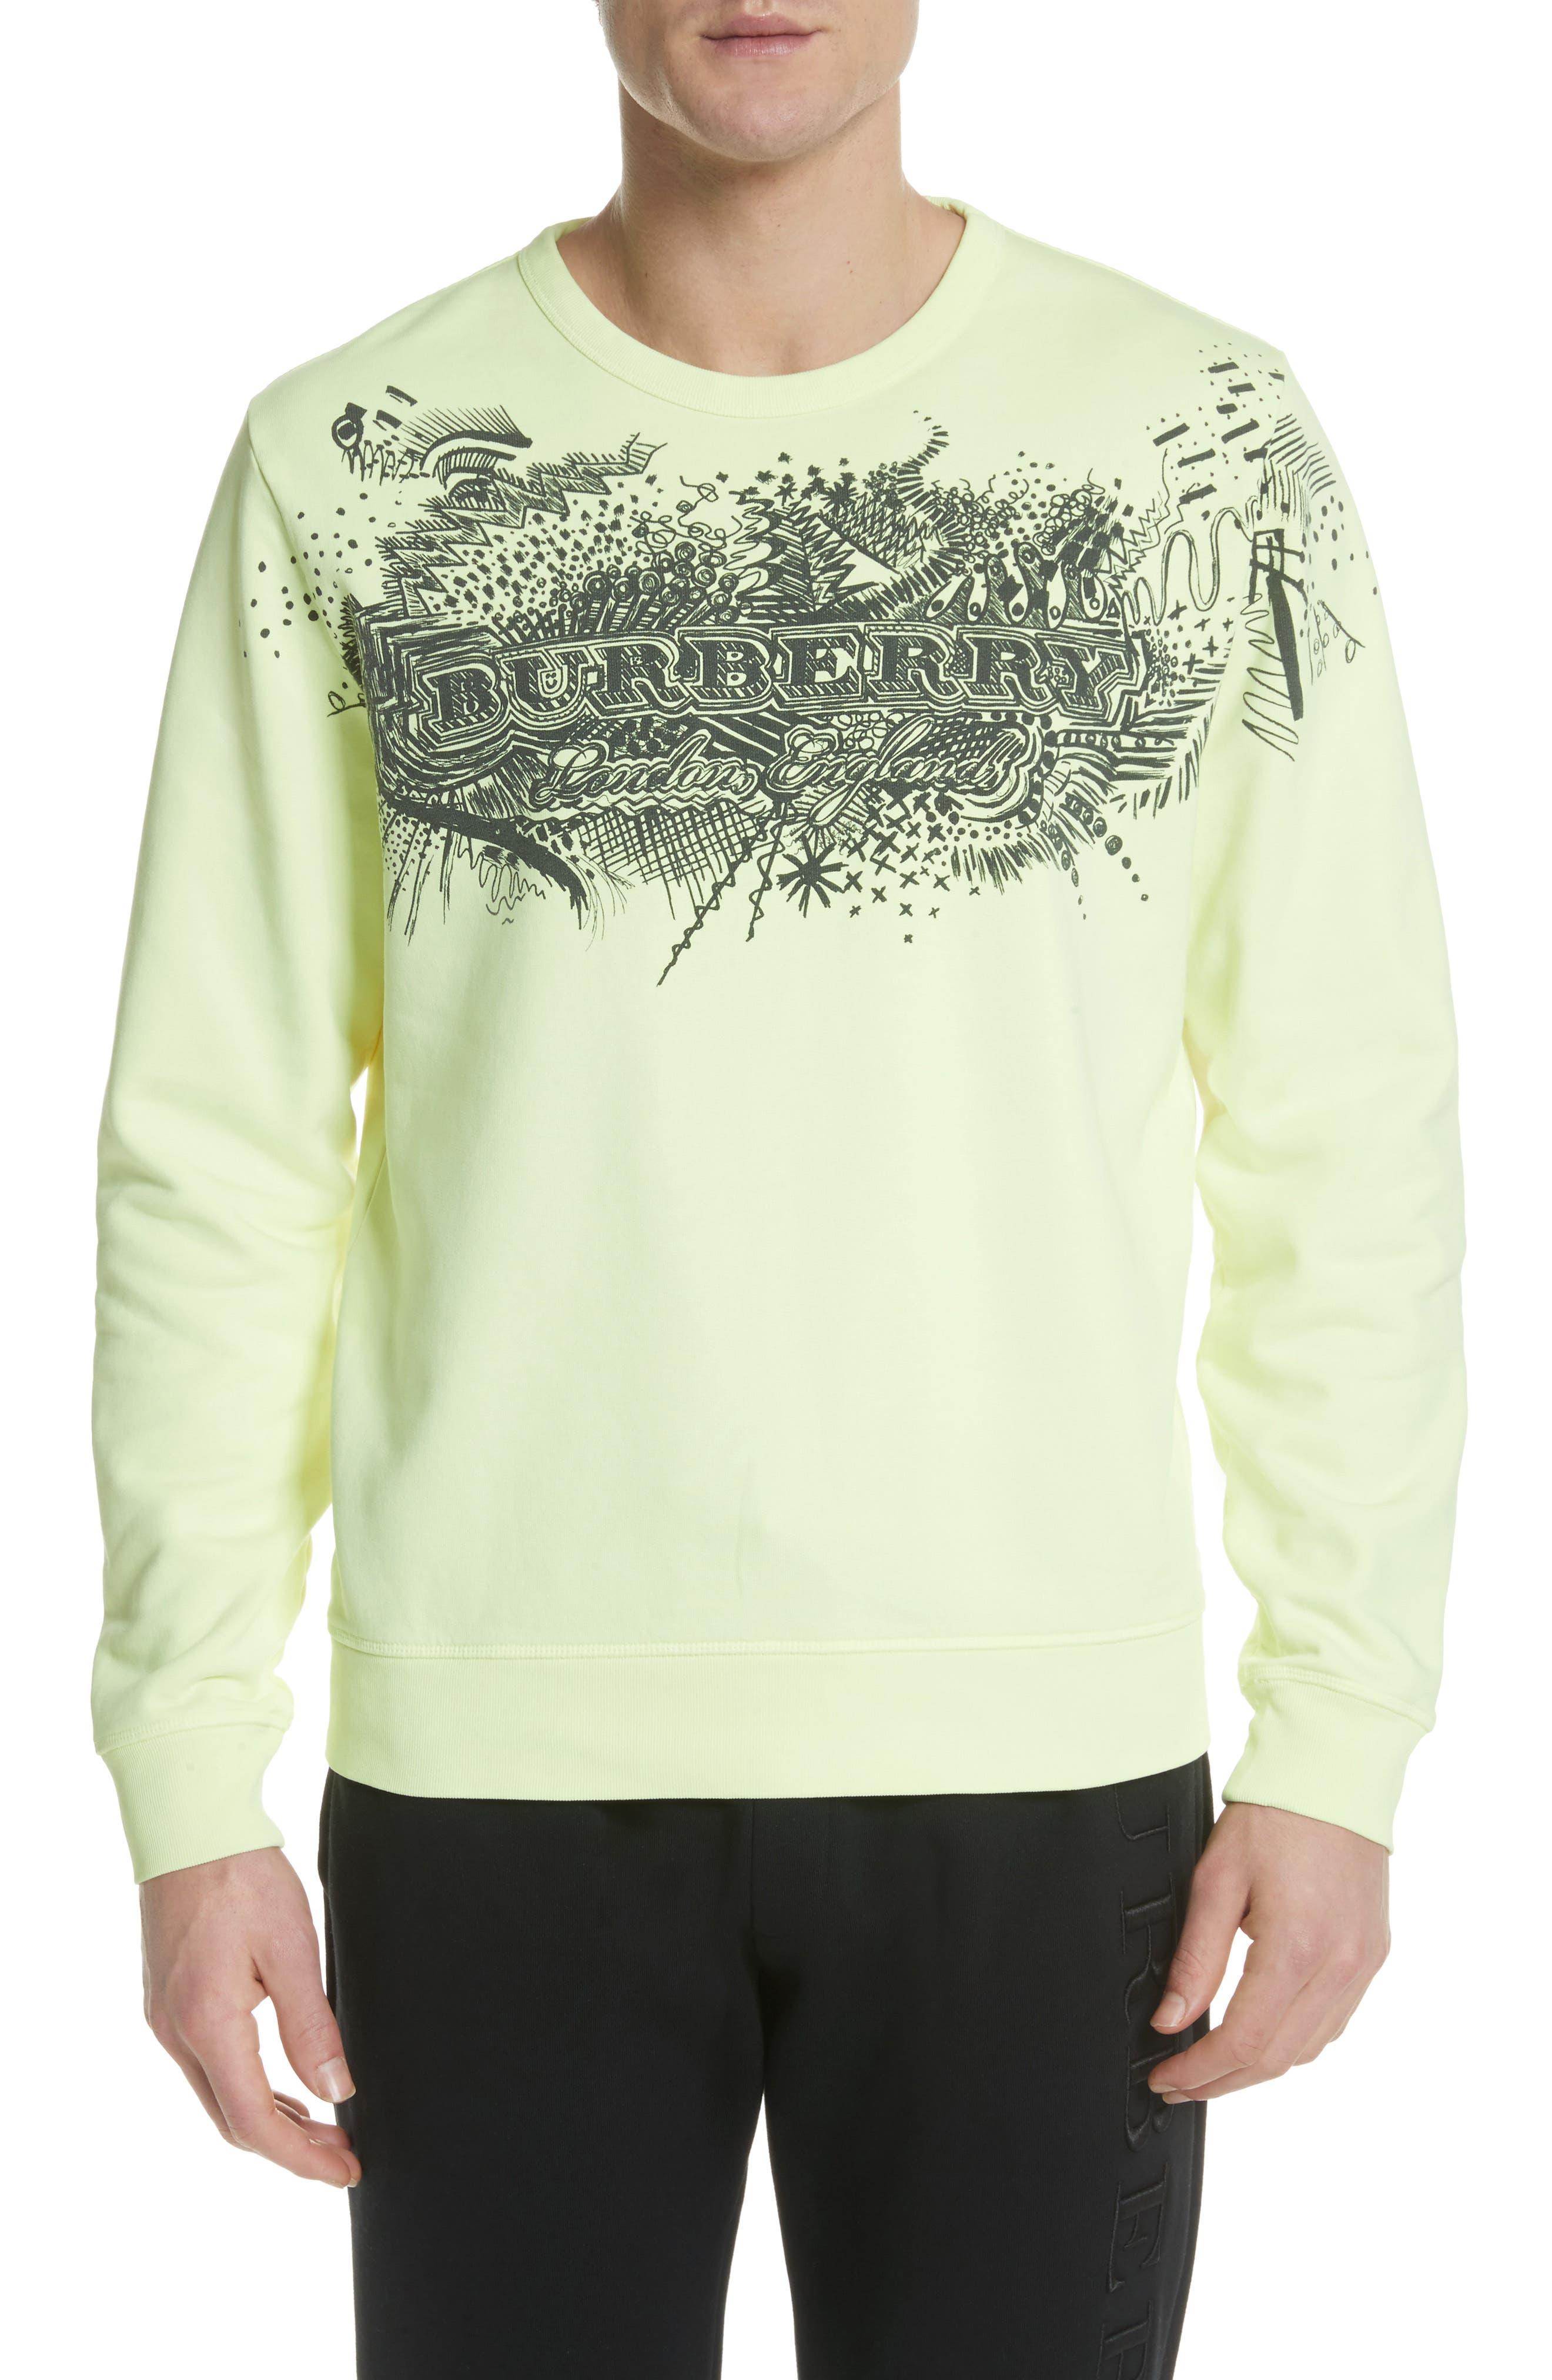 Burberry Sauer Graphic Crewneck Sweatshirt